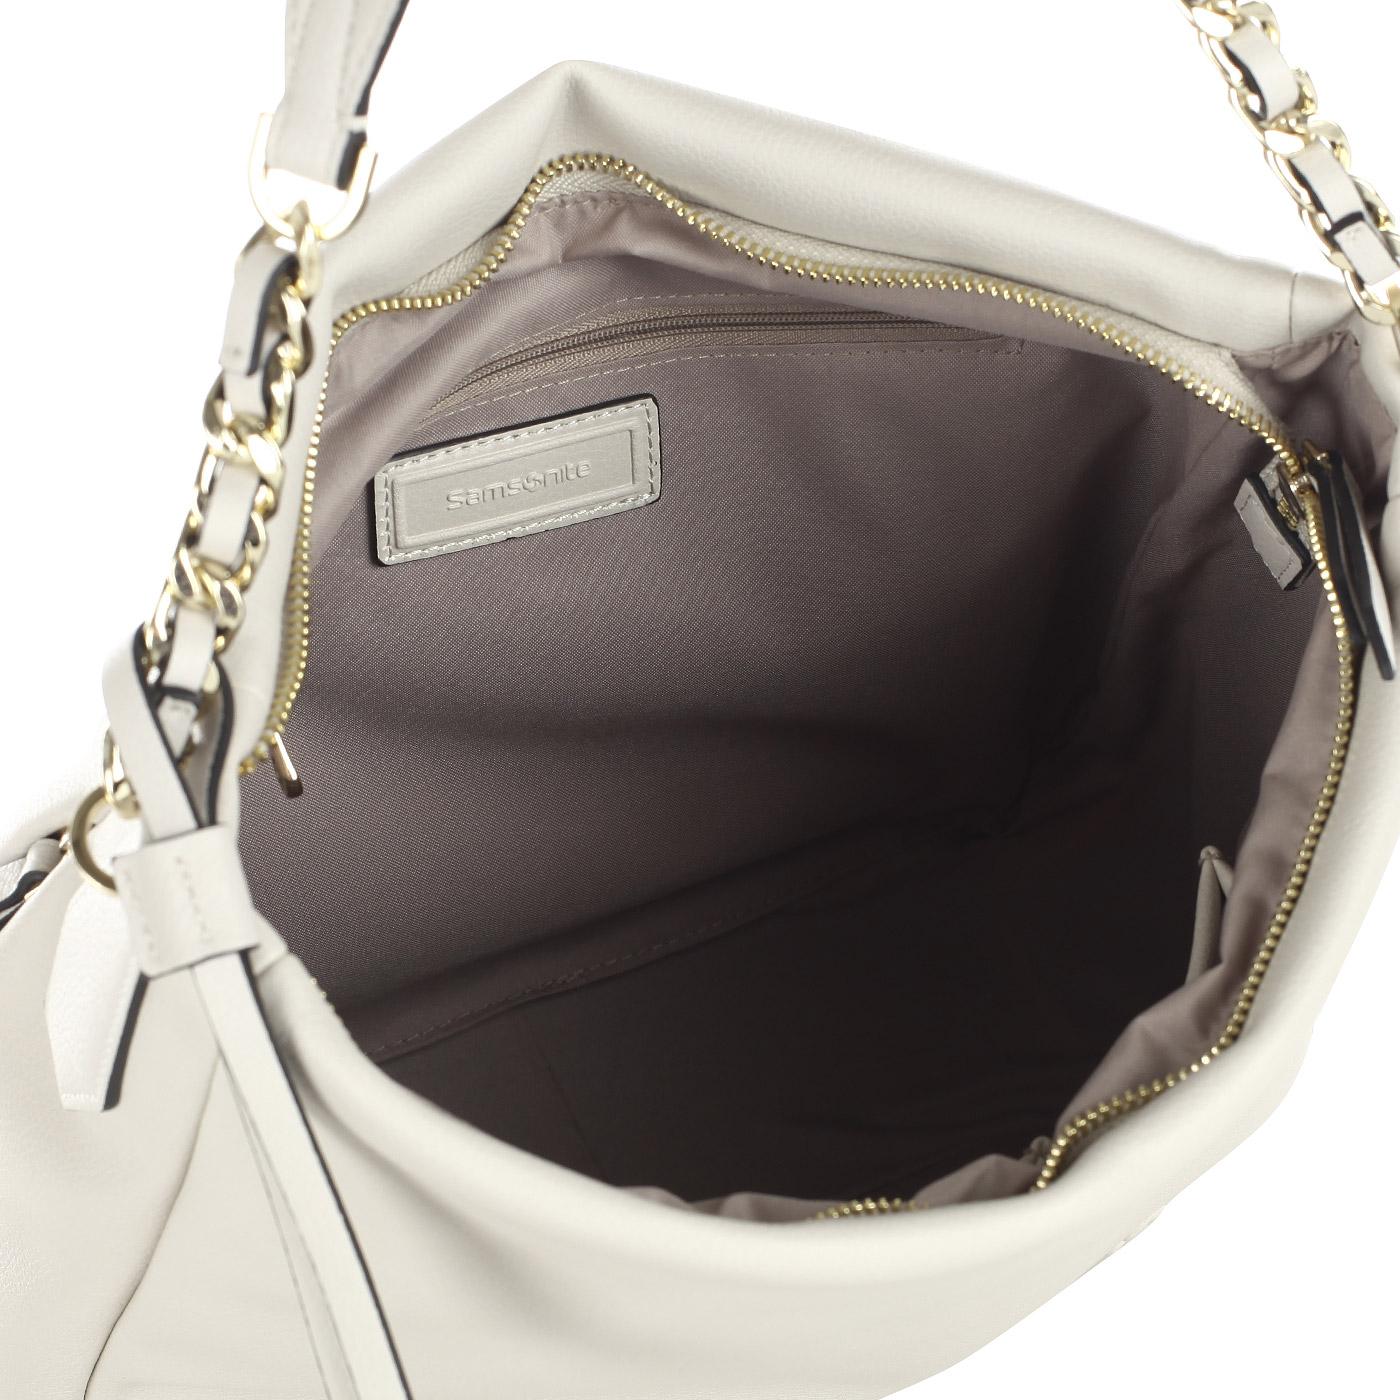 583fcdb4d57f Женская мягкая сумка Samsonite Satiny CA192008 - 2000557887244 серый ...